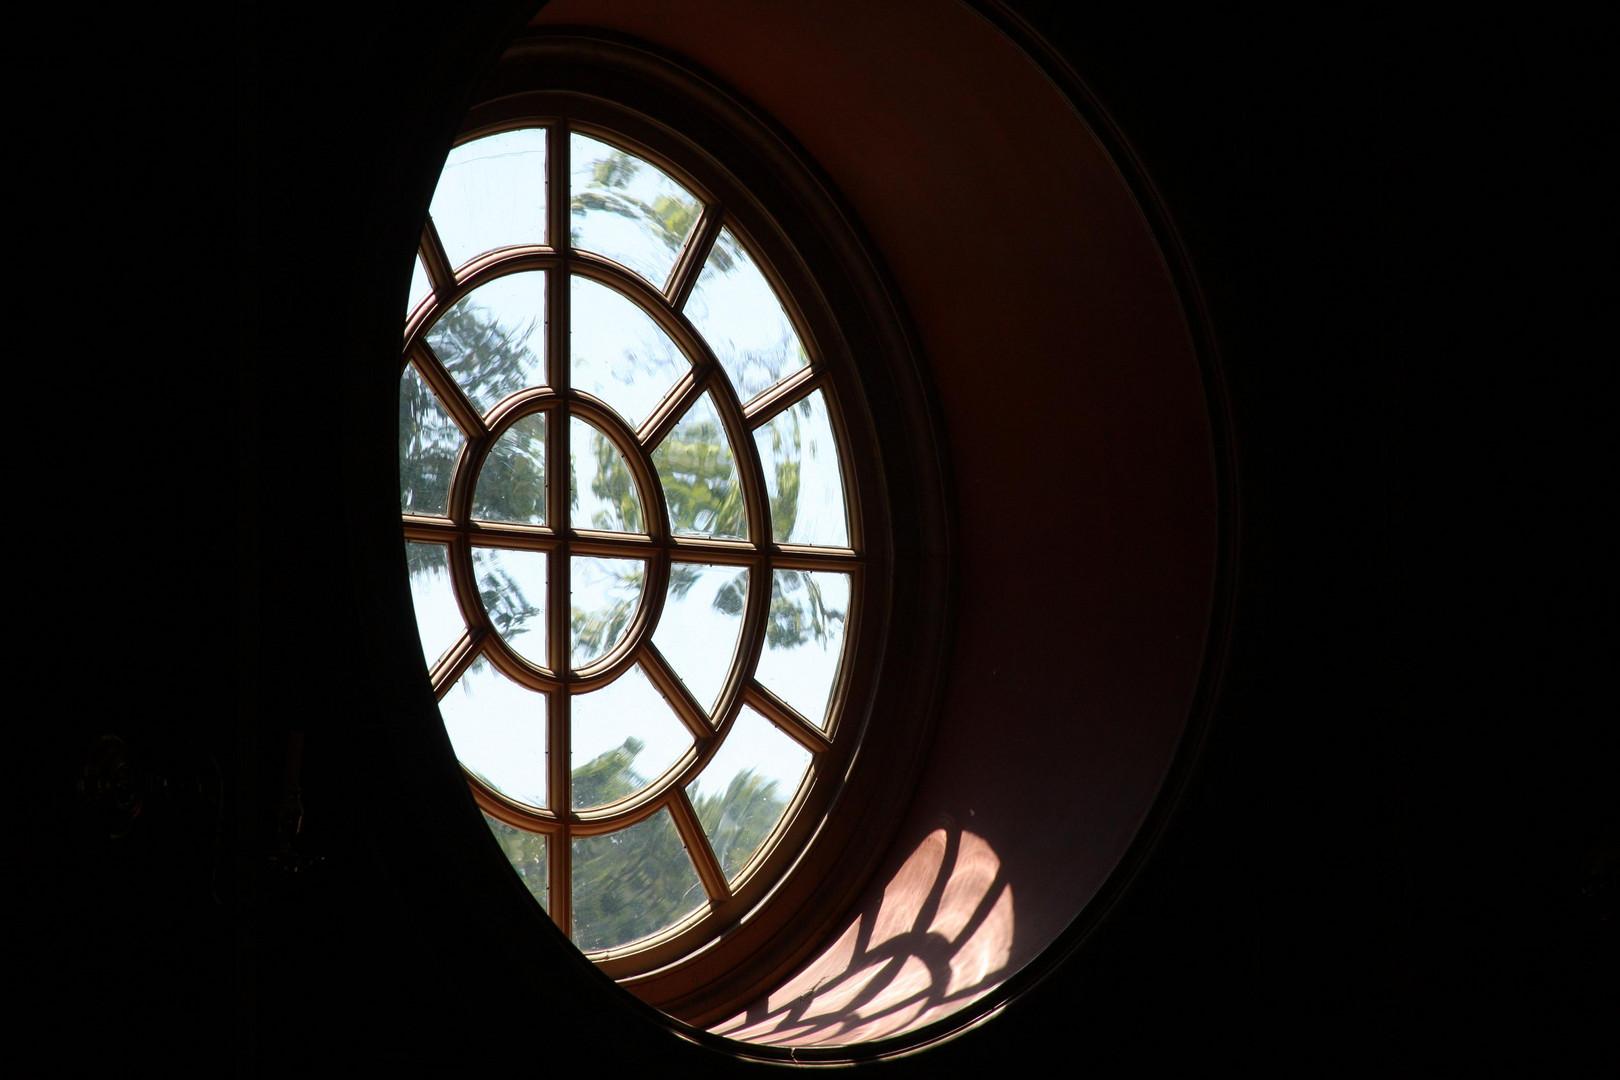 Window Colonial Williamsburg.